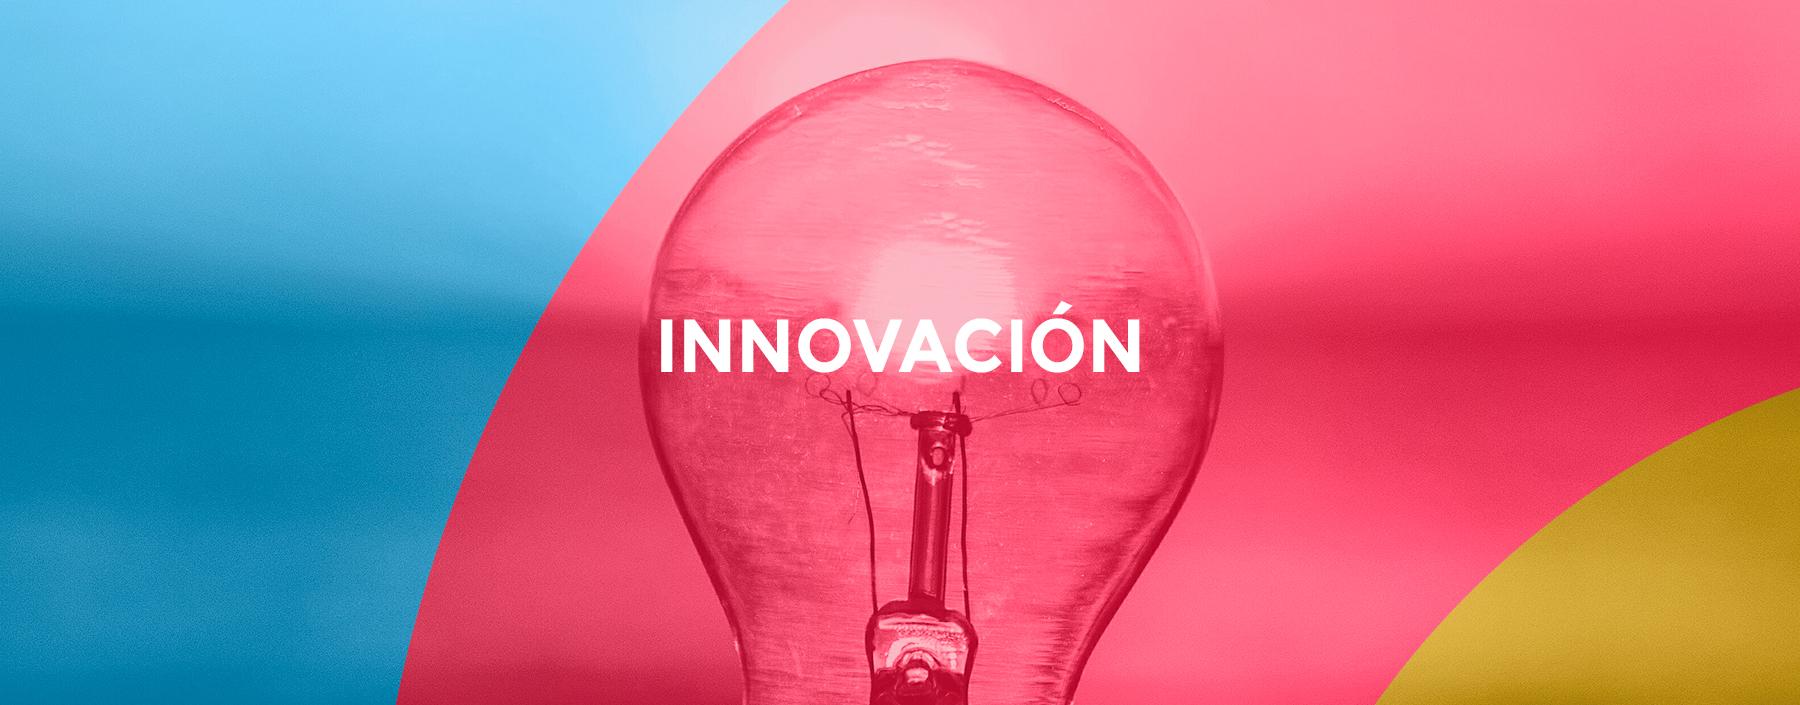 banner-innovacion